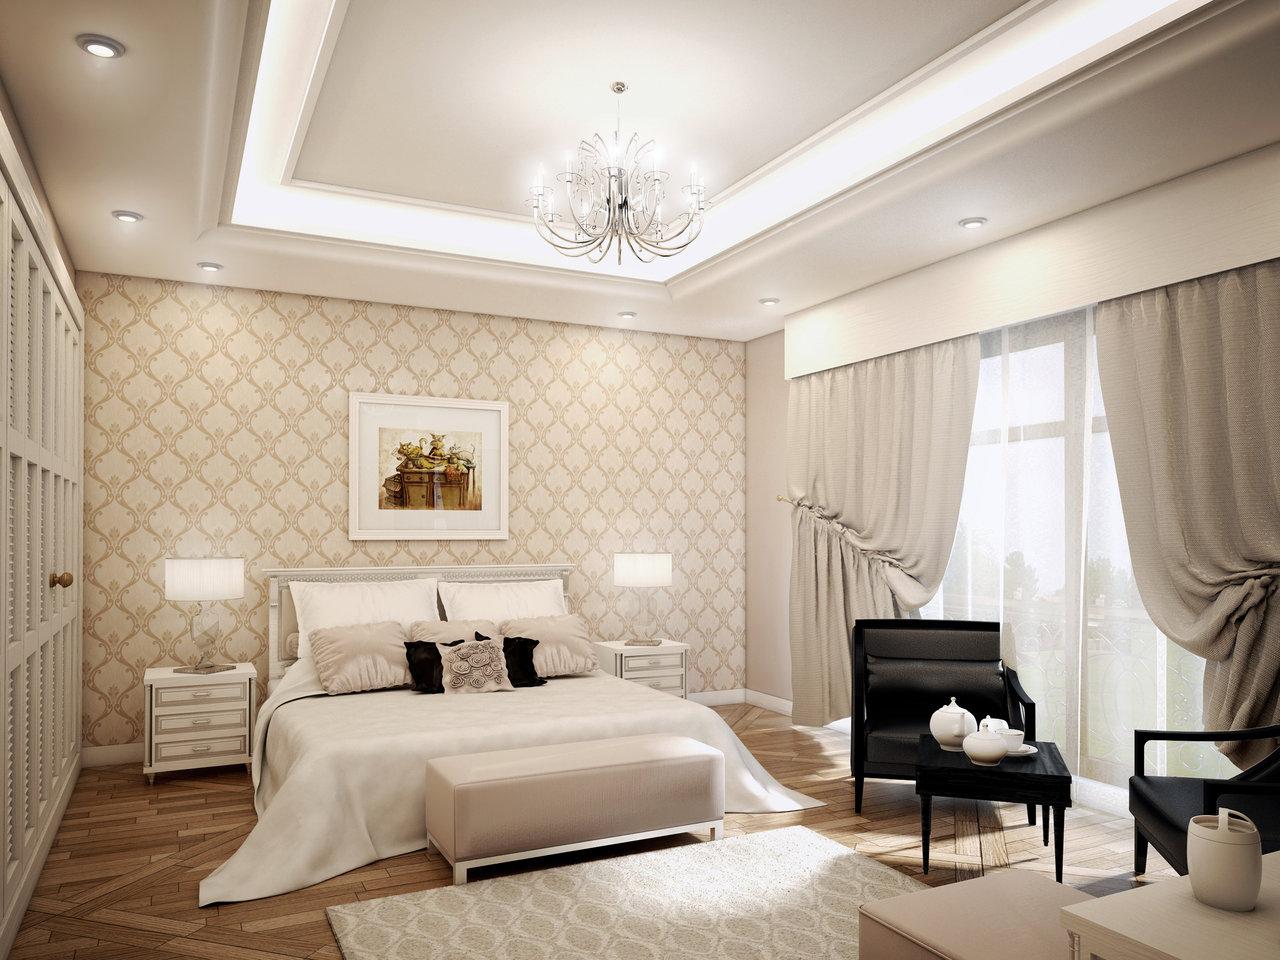 بالصور ديكورات غرف نوم 2019 , ديكور رائع لغرفة اروع 388 11